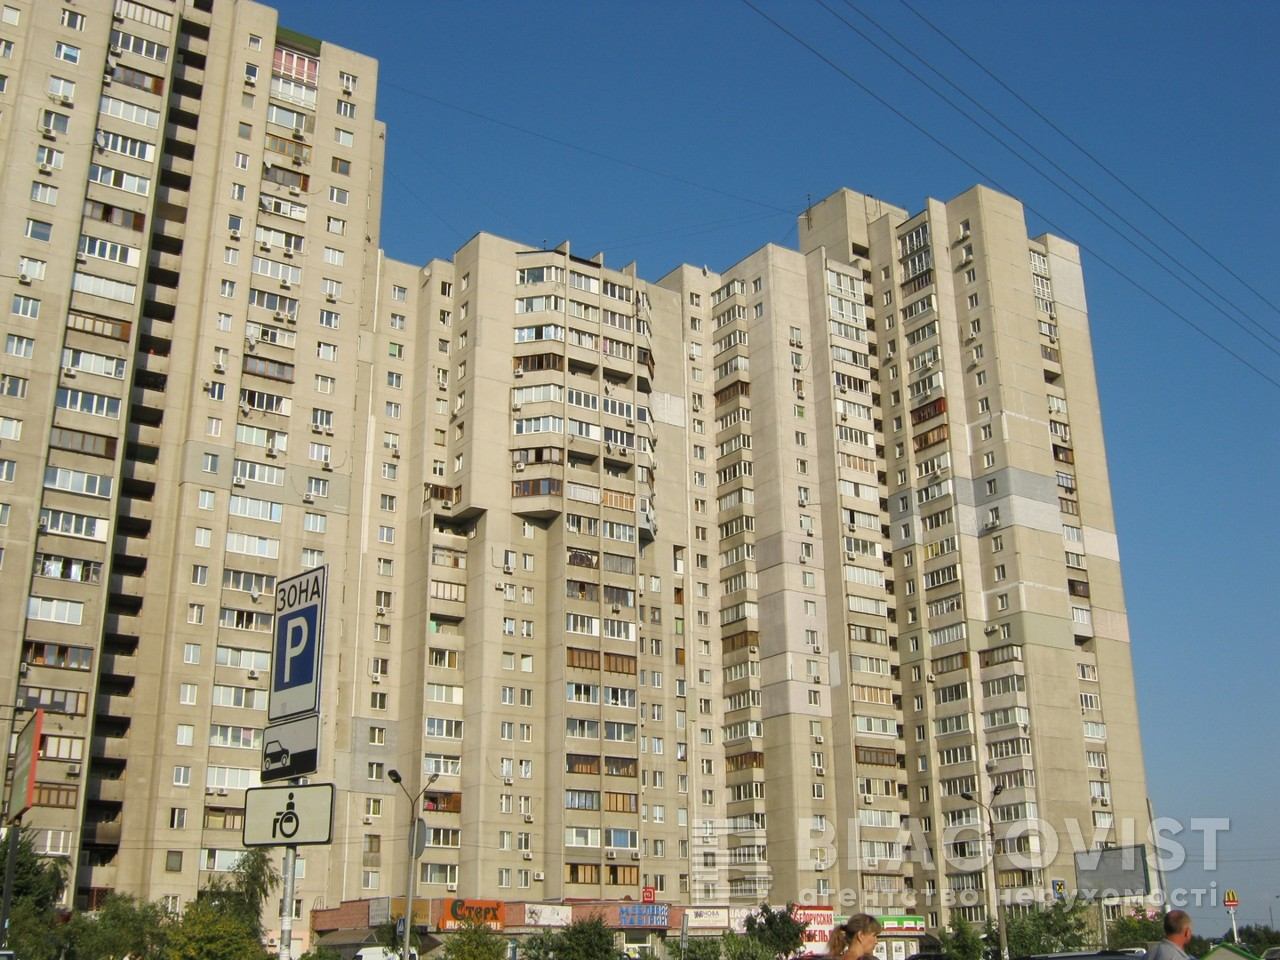 Квартира B-73528, Декабристов, 12/37, Киев - Фото 1